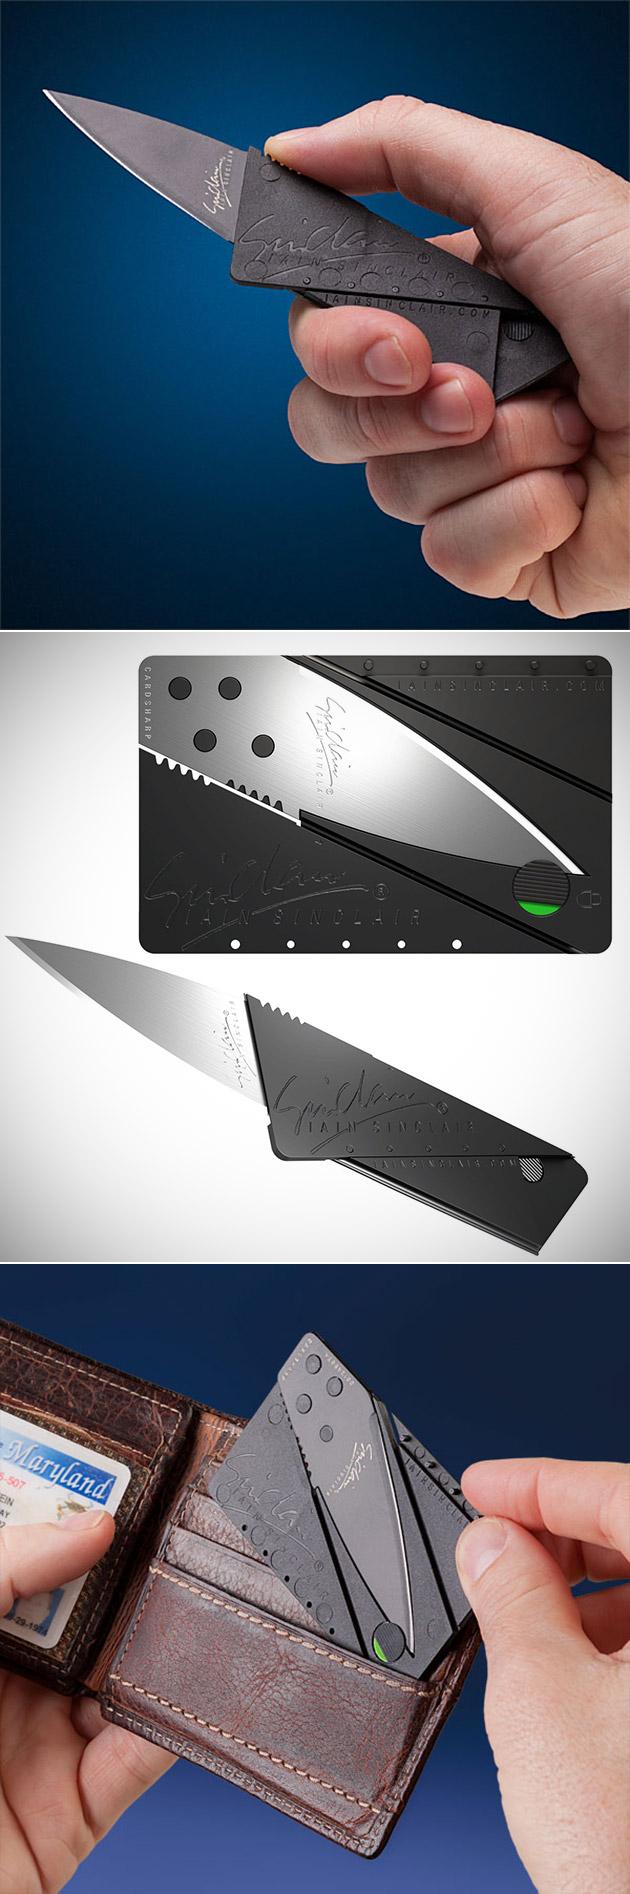 Credit Card CardSharp2